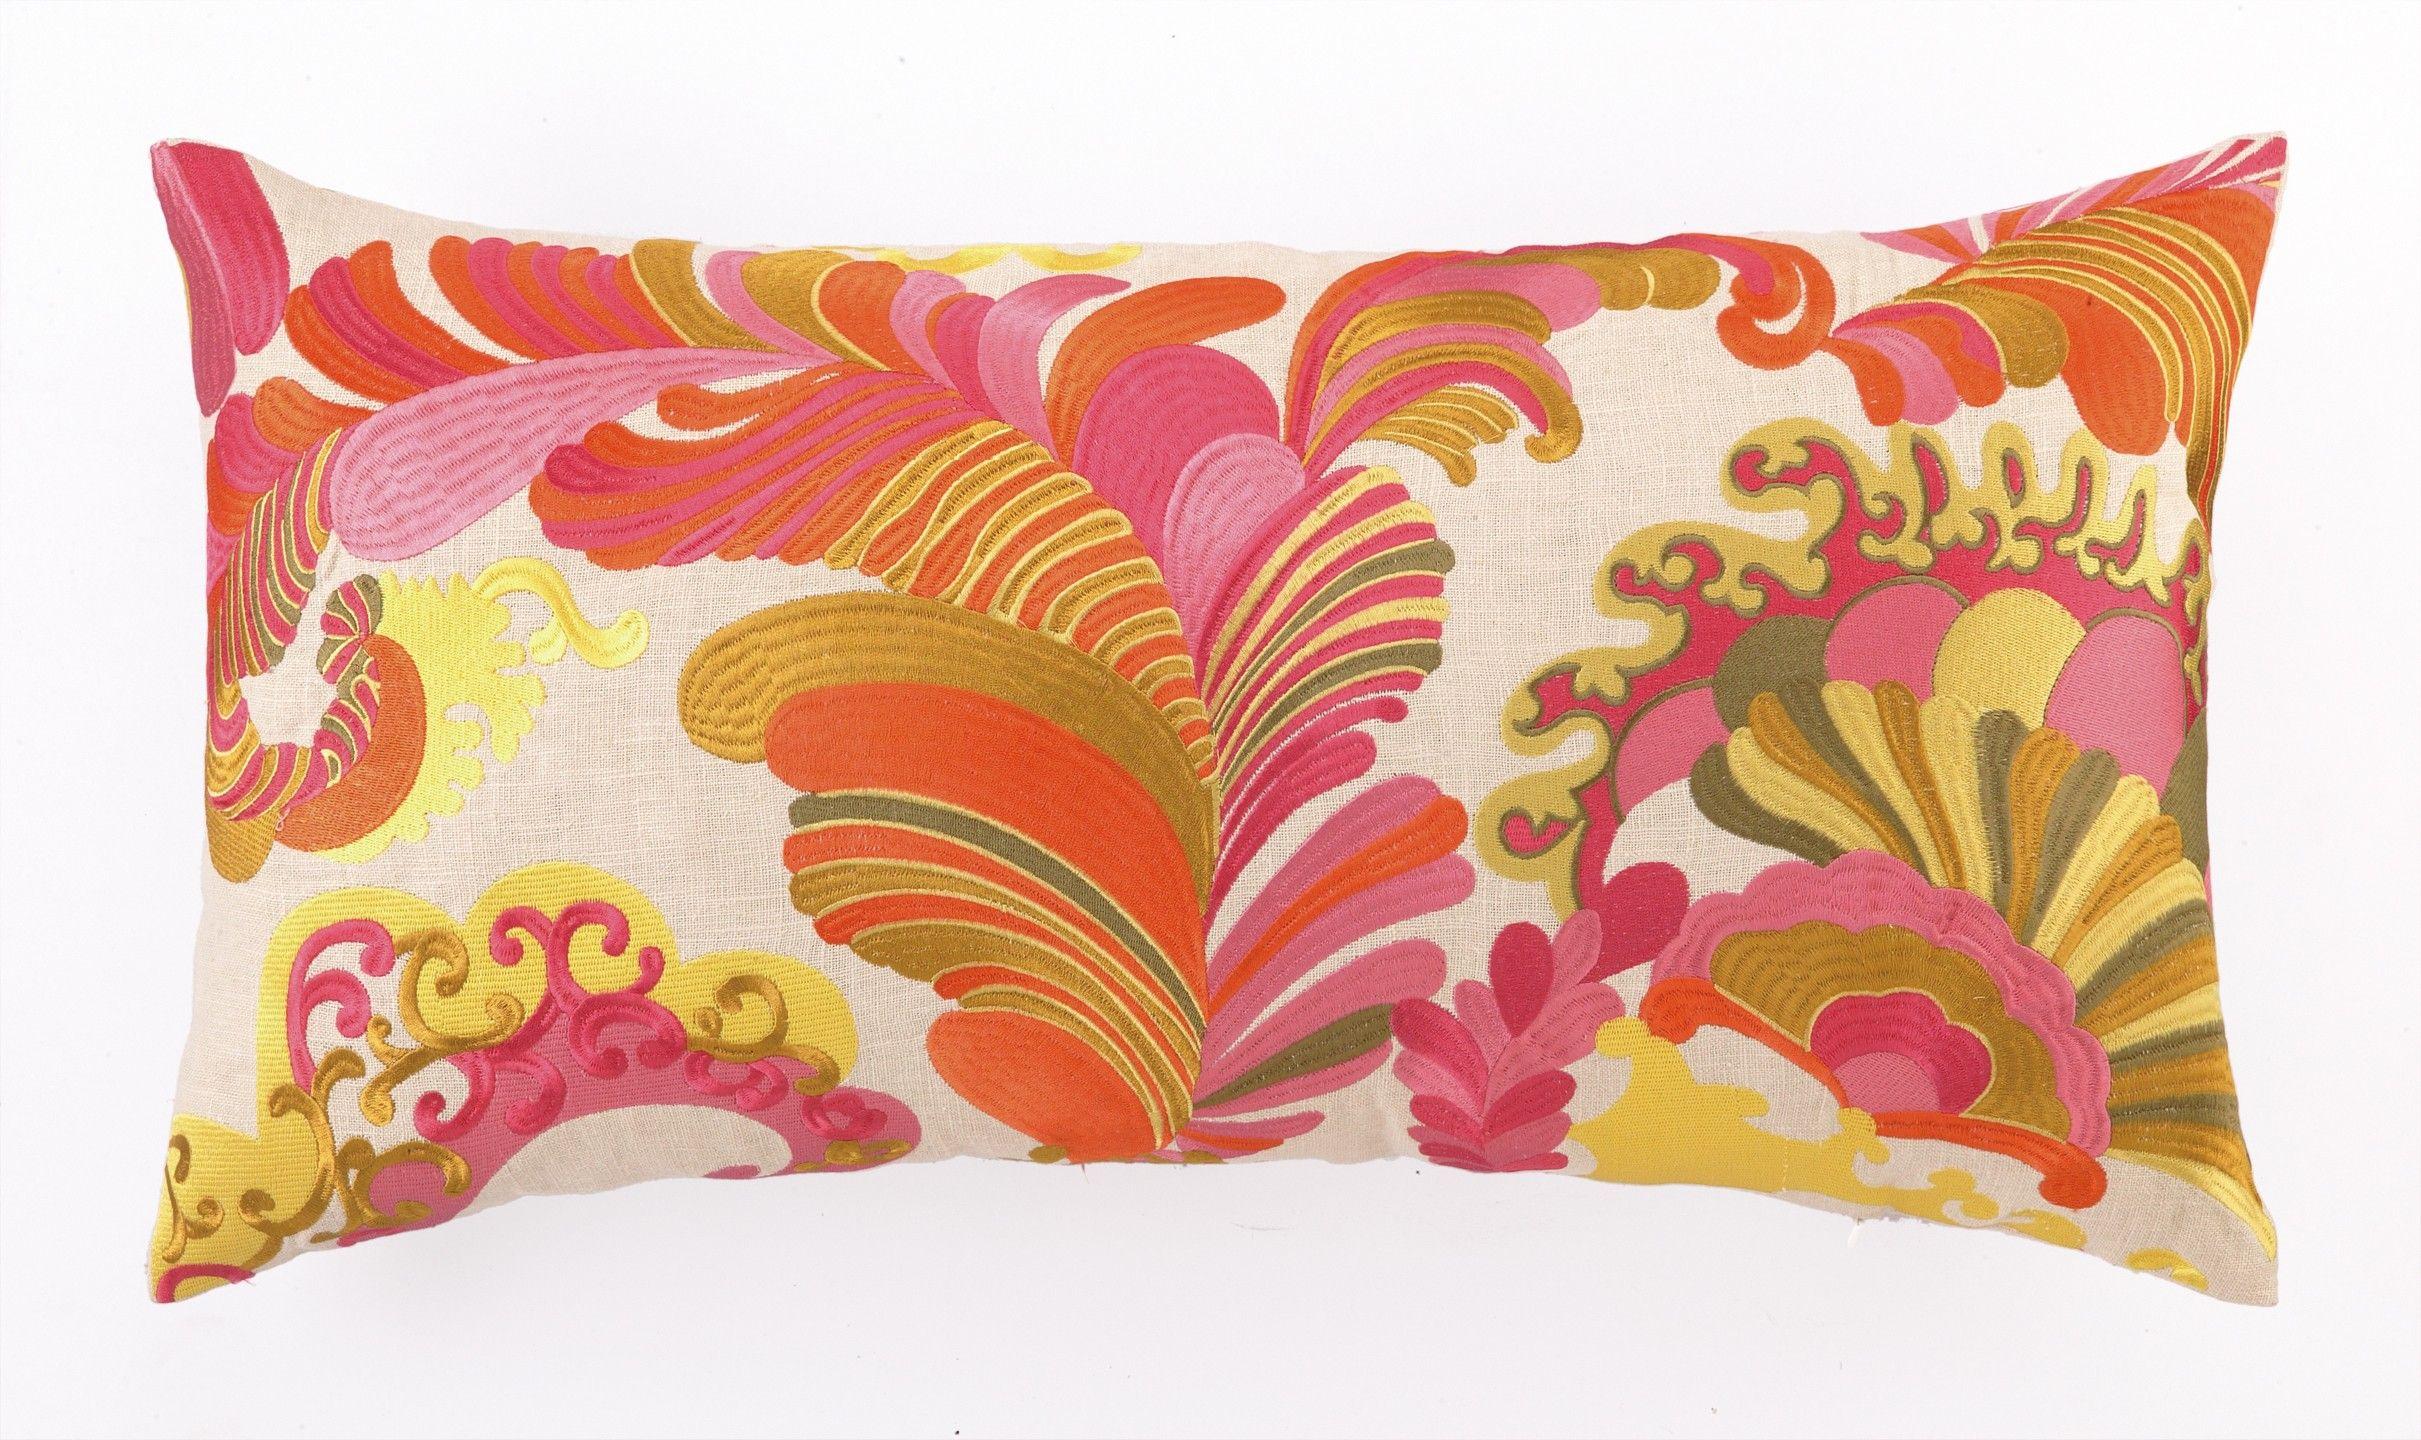 Trina Turk Coachella Embroidered Pillow